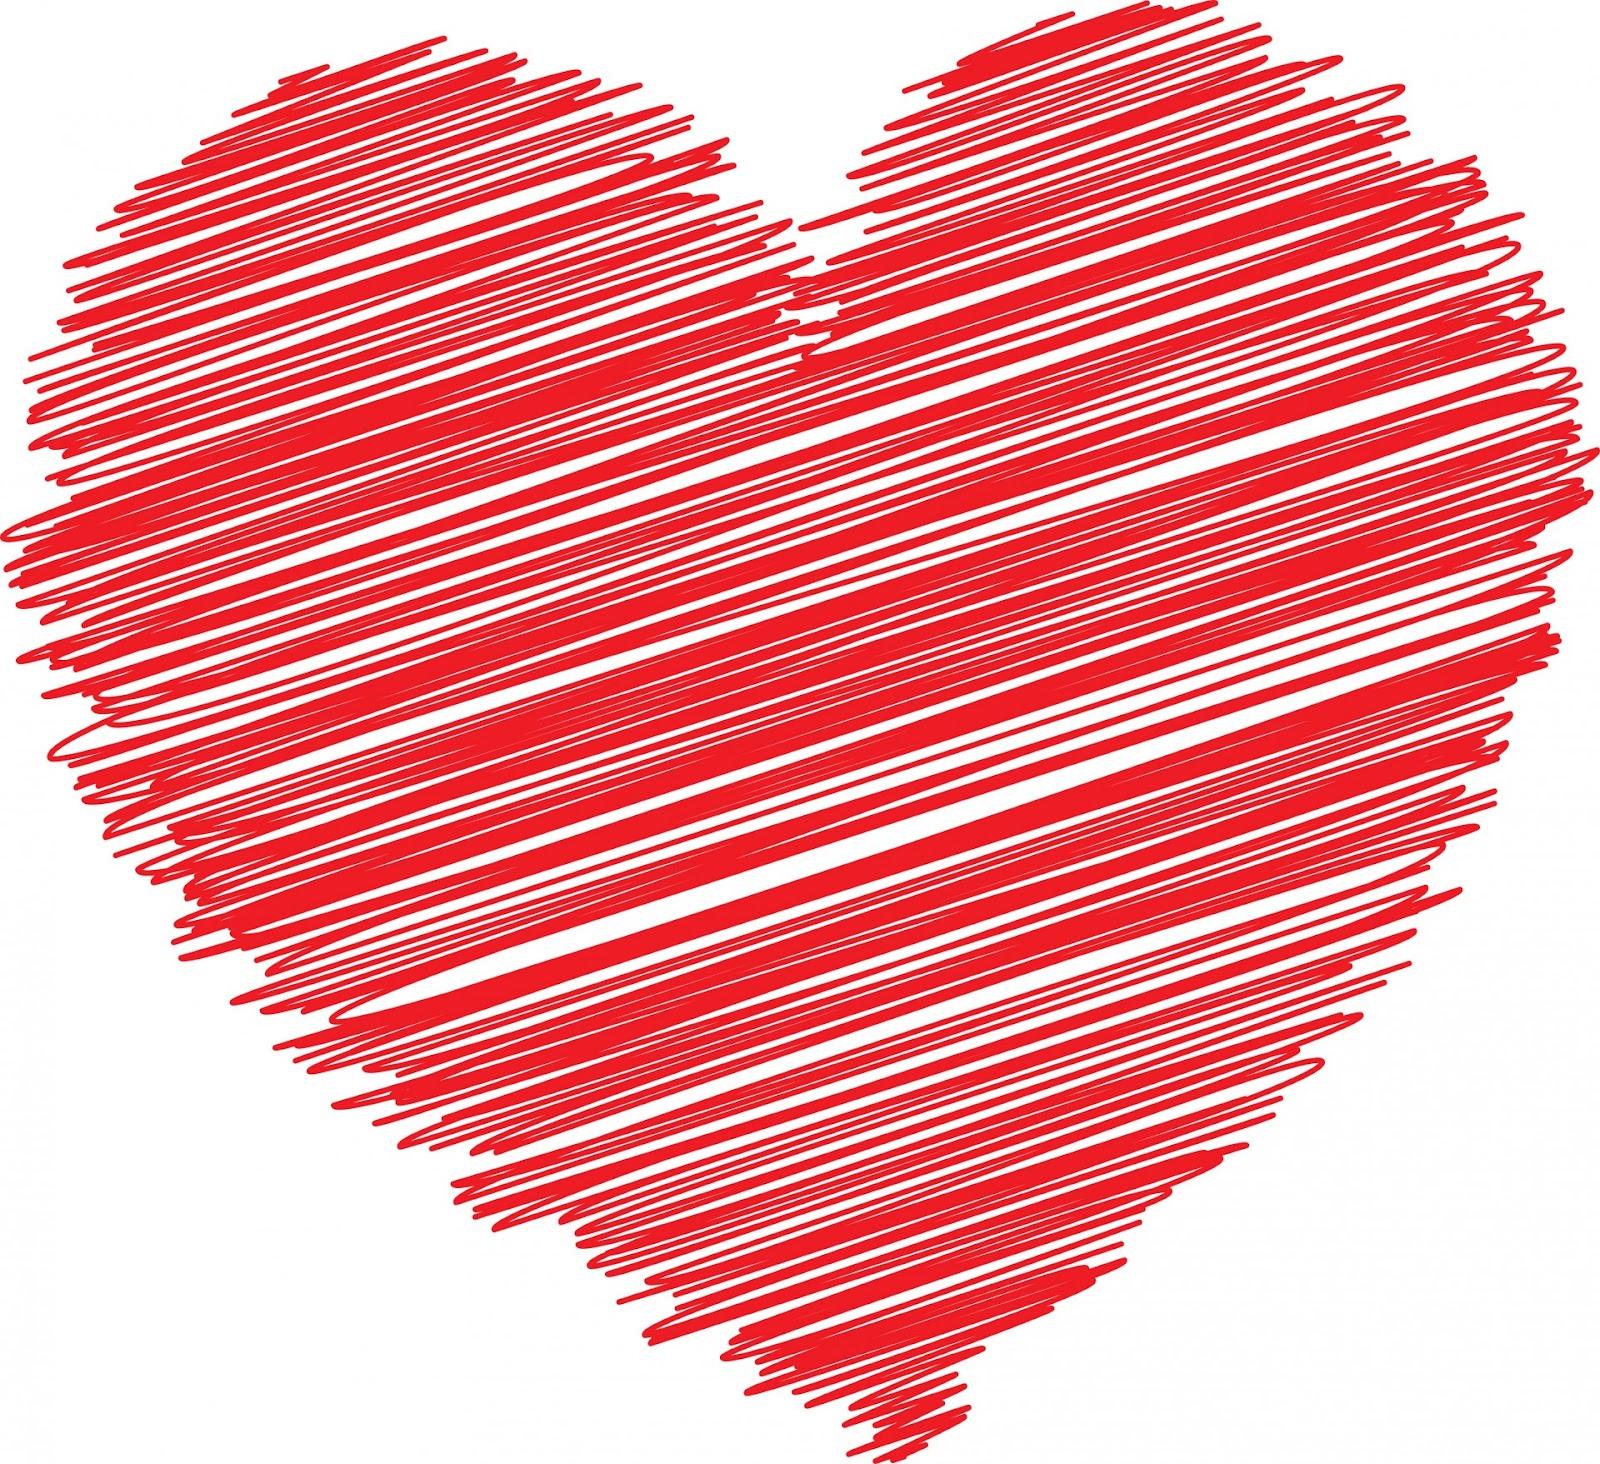 Heart Images - Public Domain Pictures - Page 1